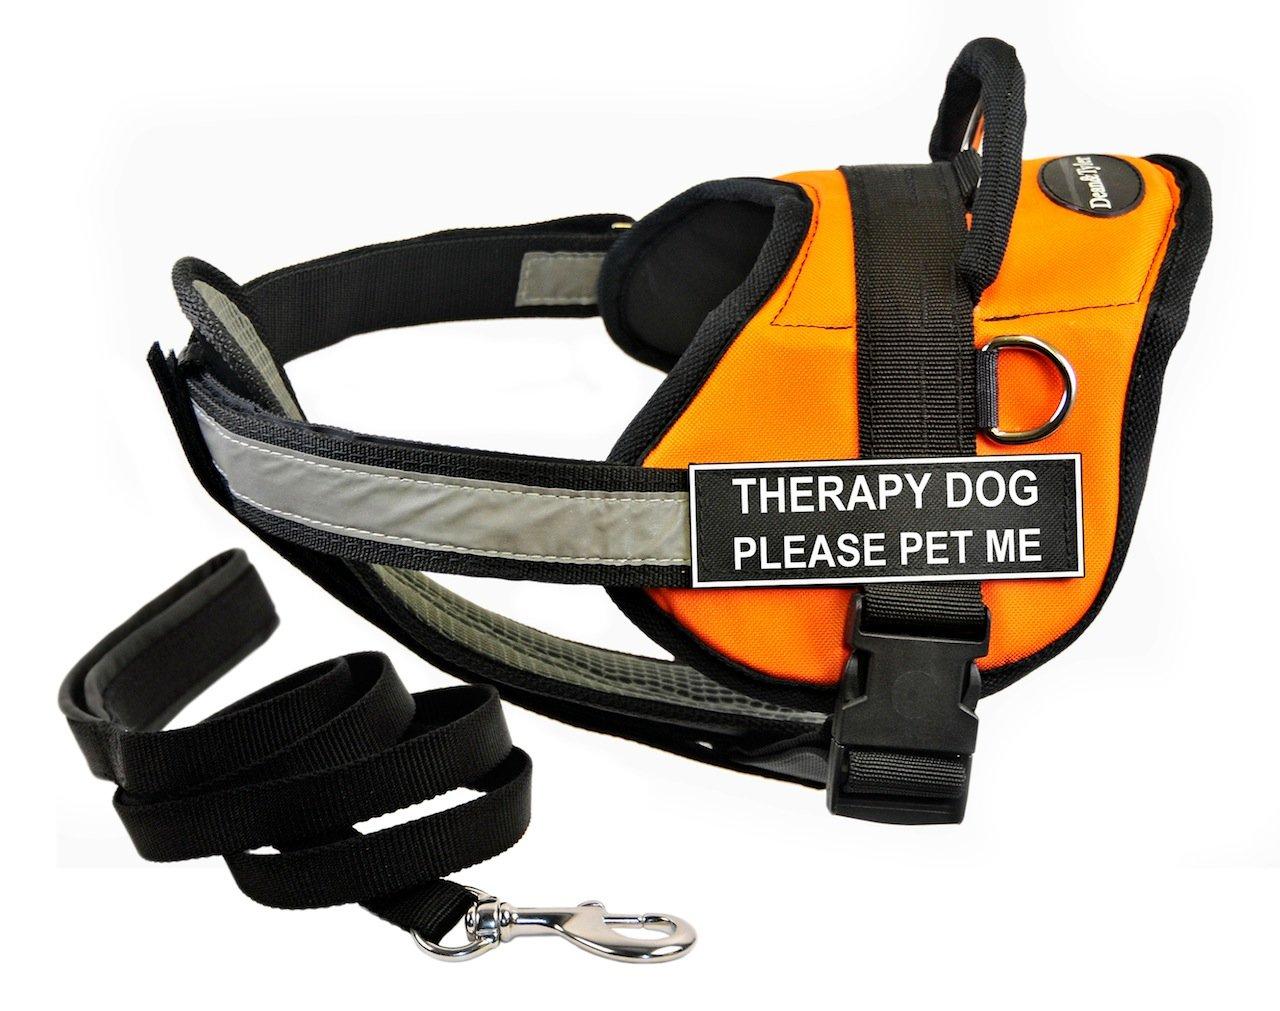 Dean & Tyler DT Works Works Works Arancione Therapy Dog Please Pet Me Torace Imbracatura con Imbottitura, XS, e Nero 1,8 m Imbottita Puppy guinzaglio. 822011